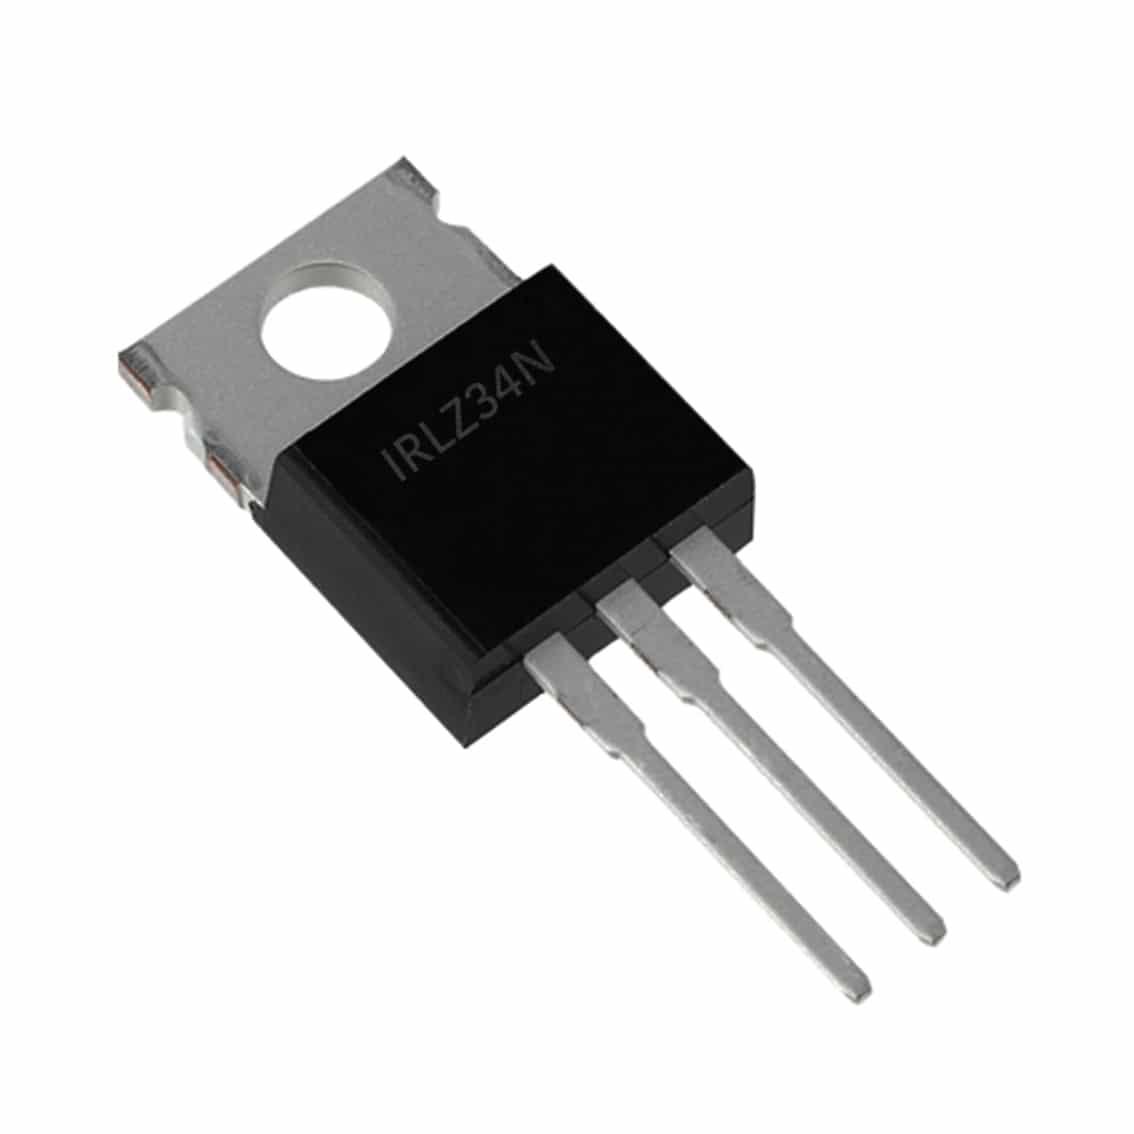 IRLZ34N 55V 30A N-Channel MOSFET Transistor Pack of 10